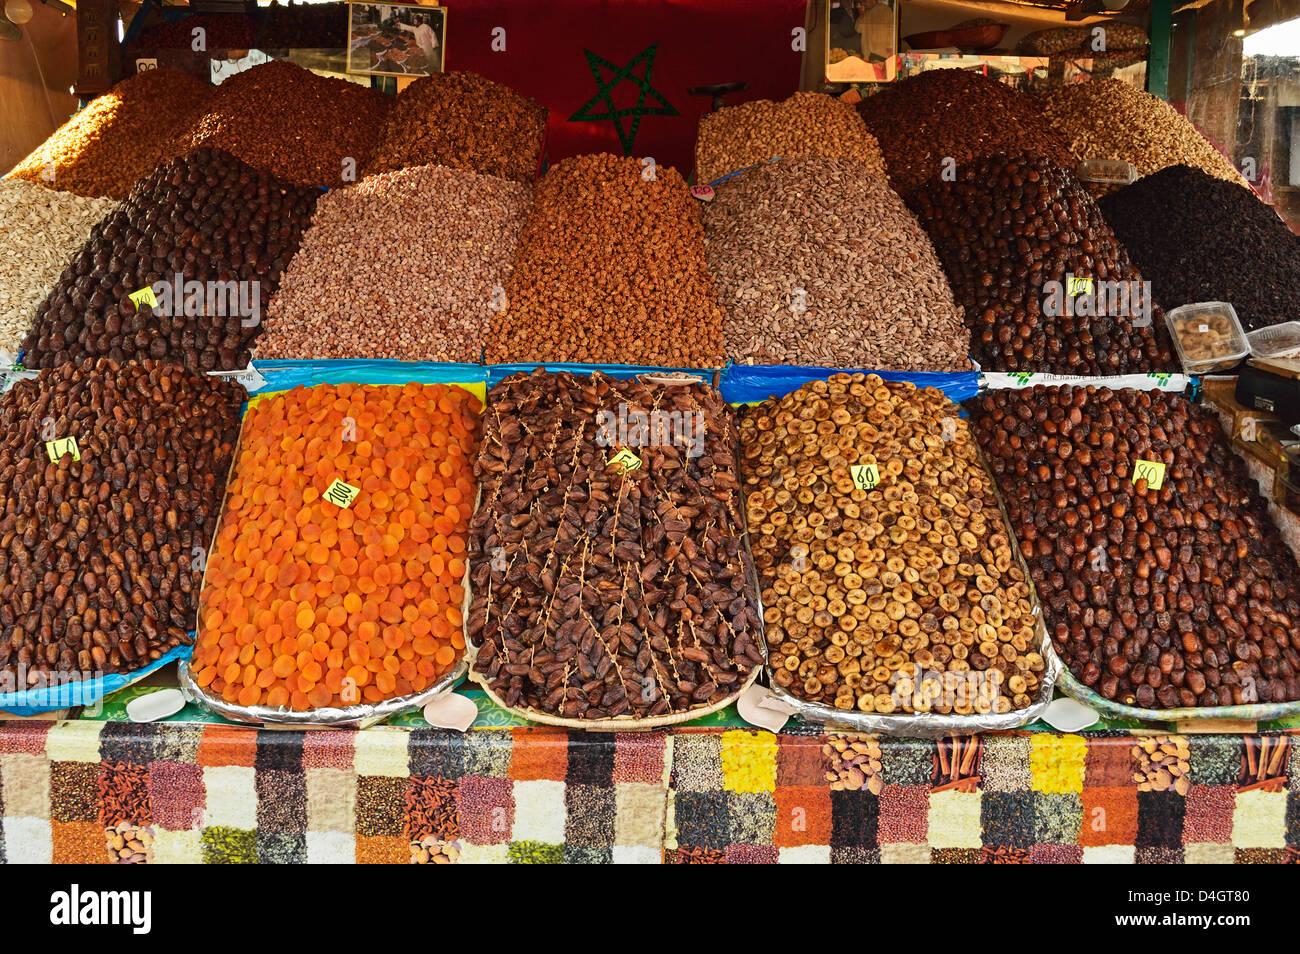 Fruit display, Marrakesh, Morocco, North Africa - Stock Image